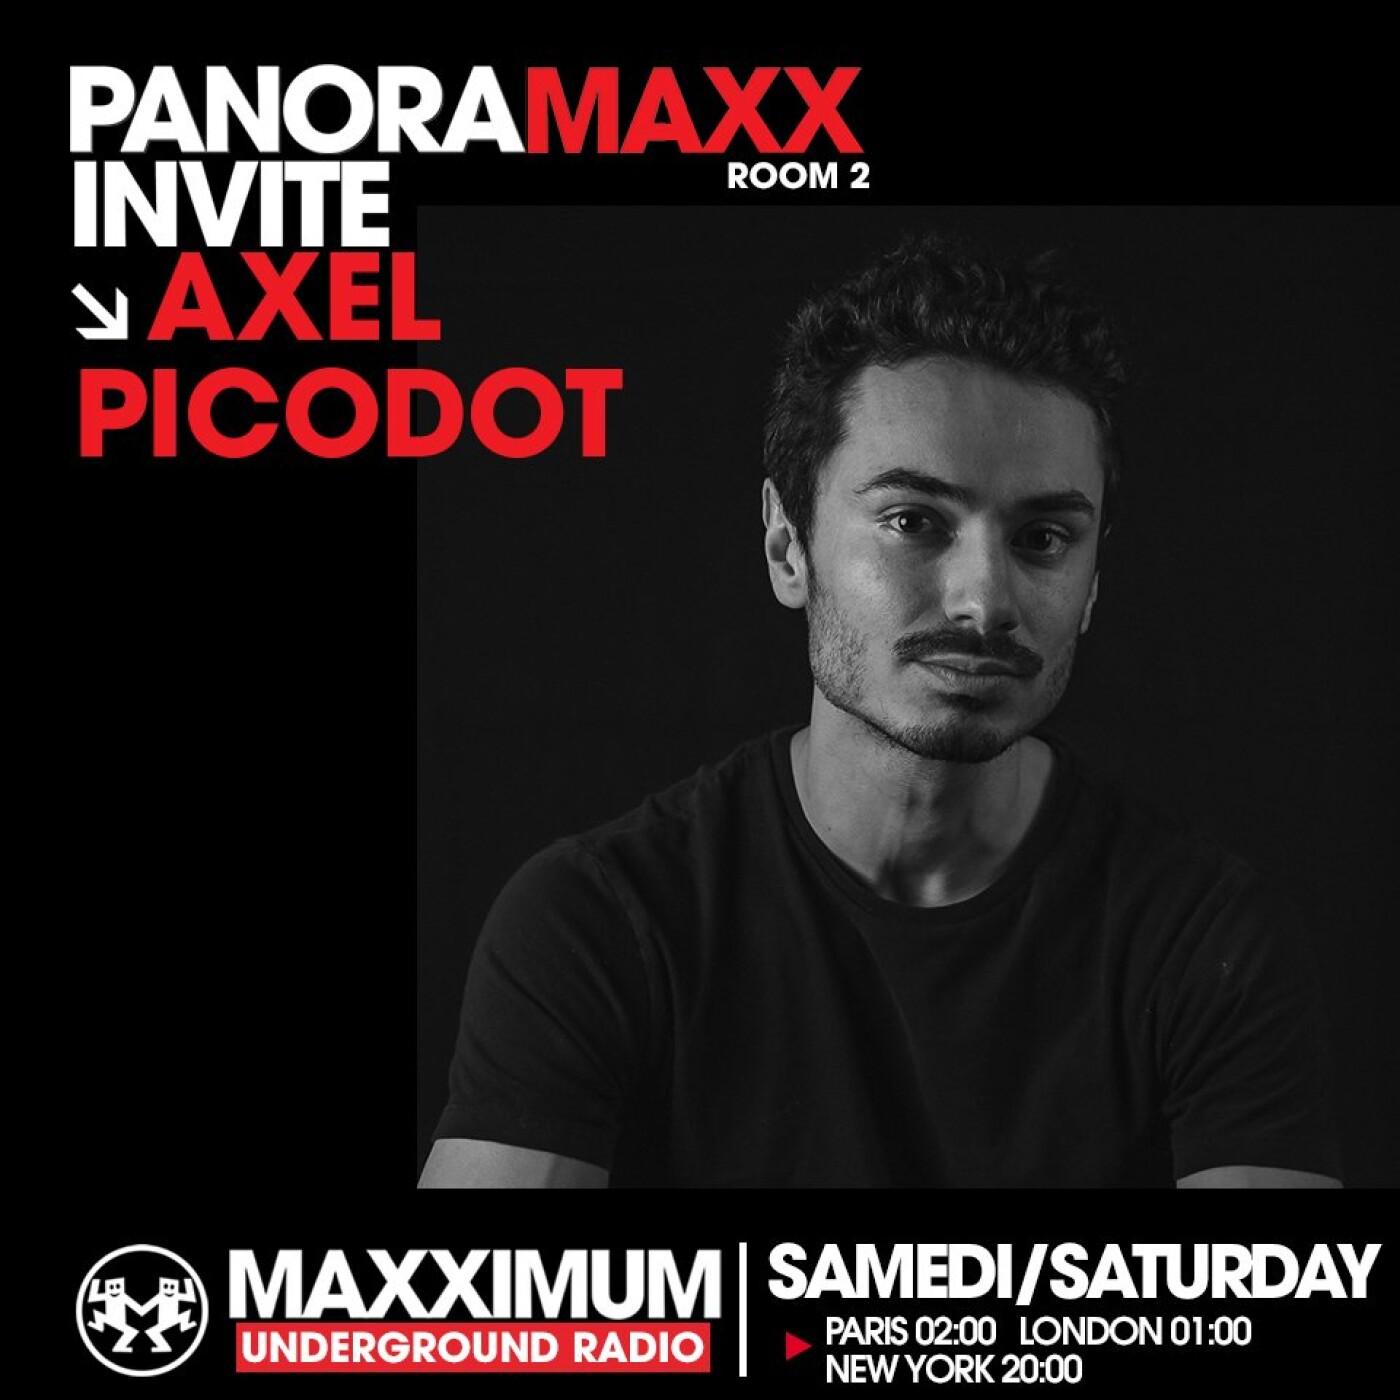 PANORAMAXX : AXEL PICODOT